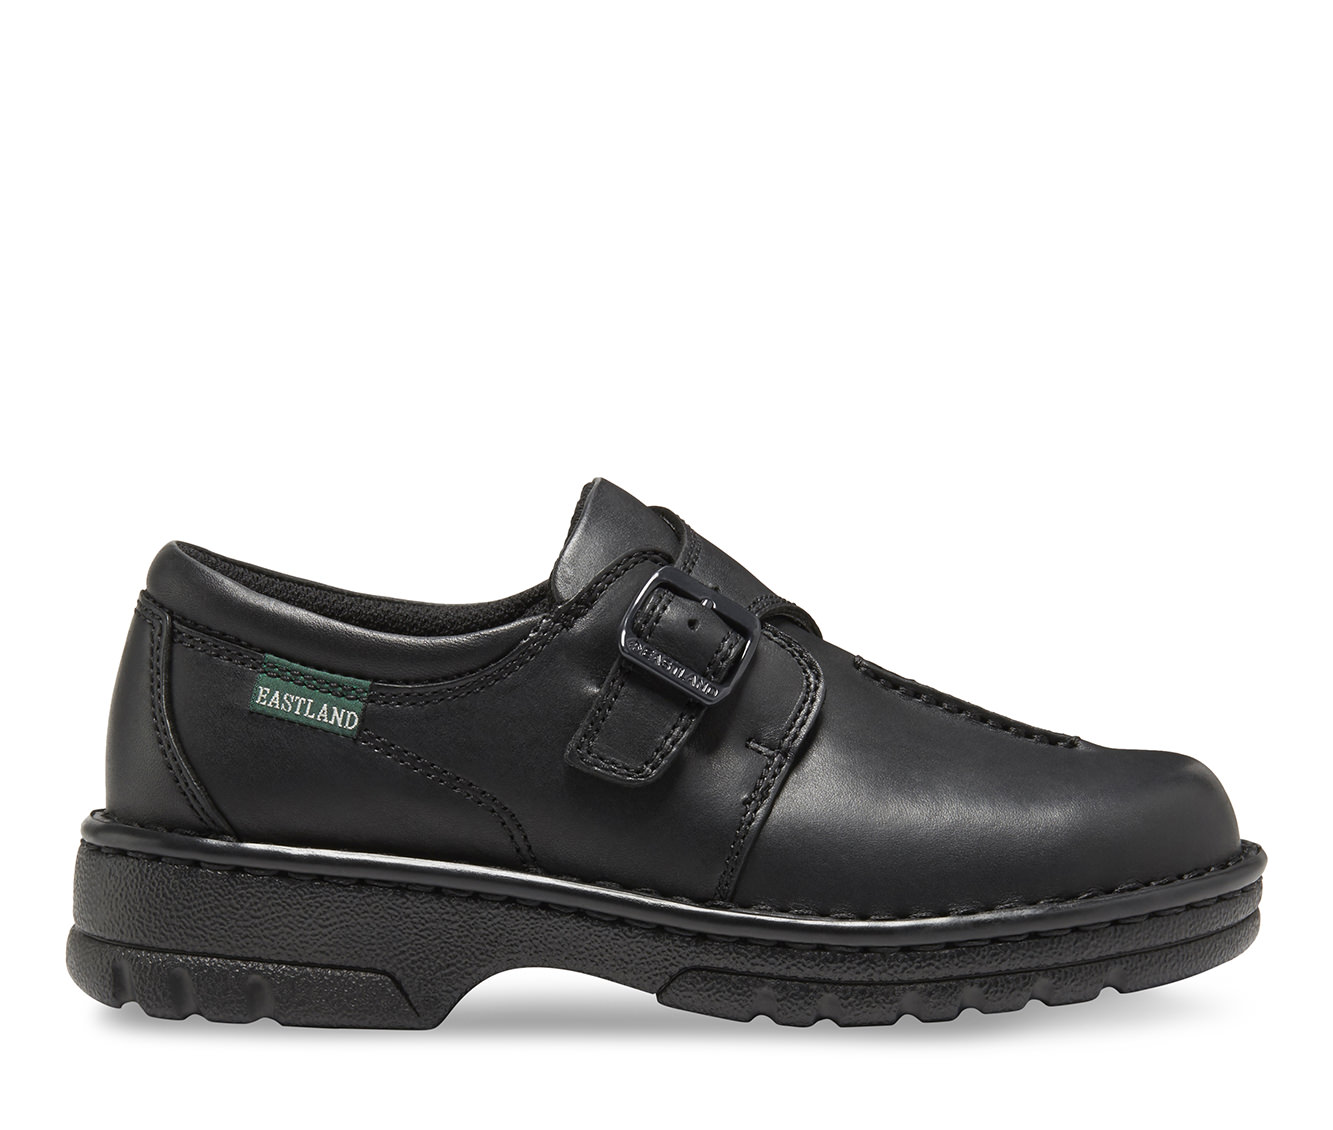 Eastland Syracuse Women's Shoe (Black Leather)